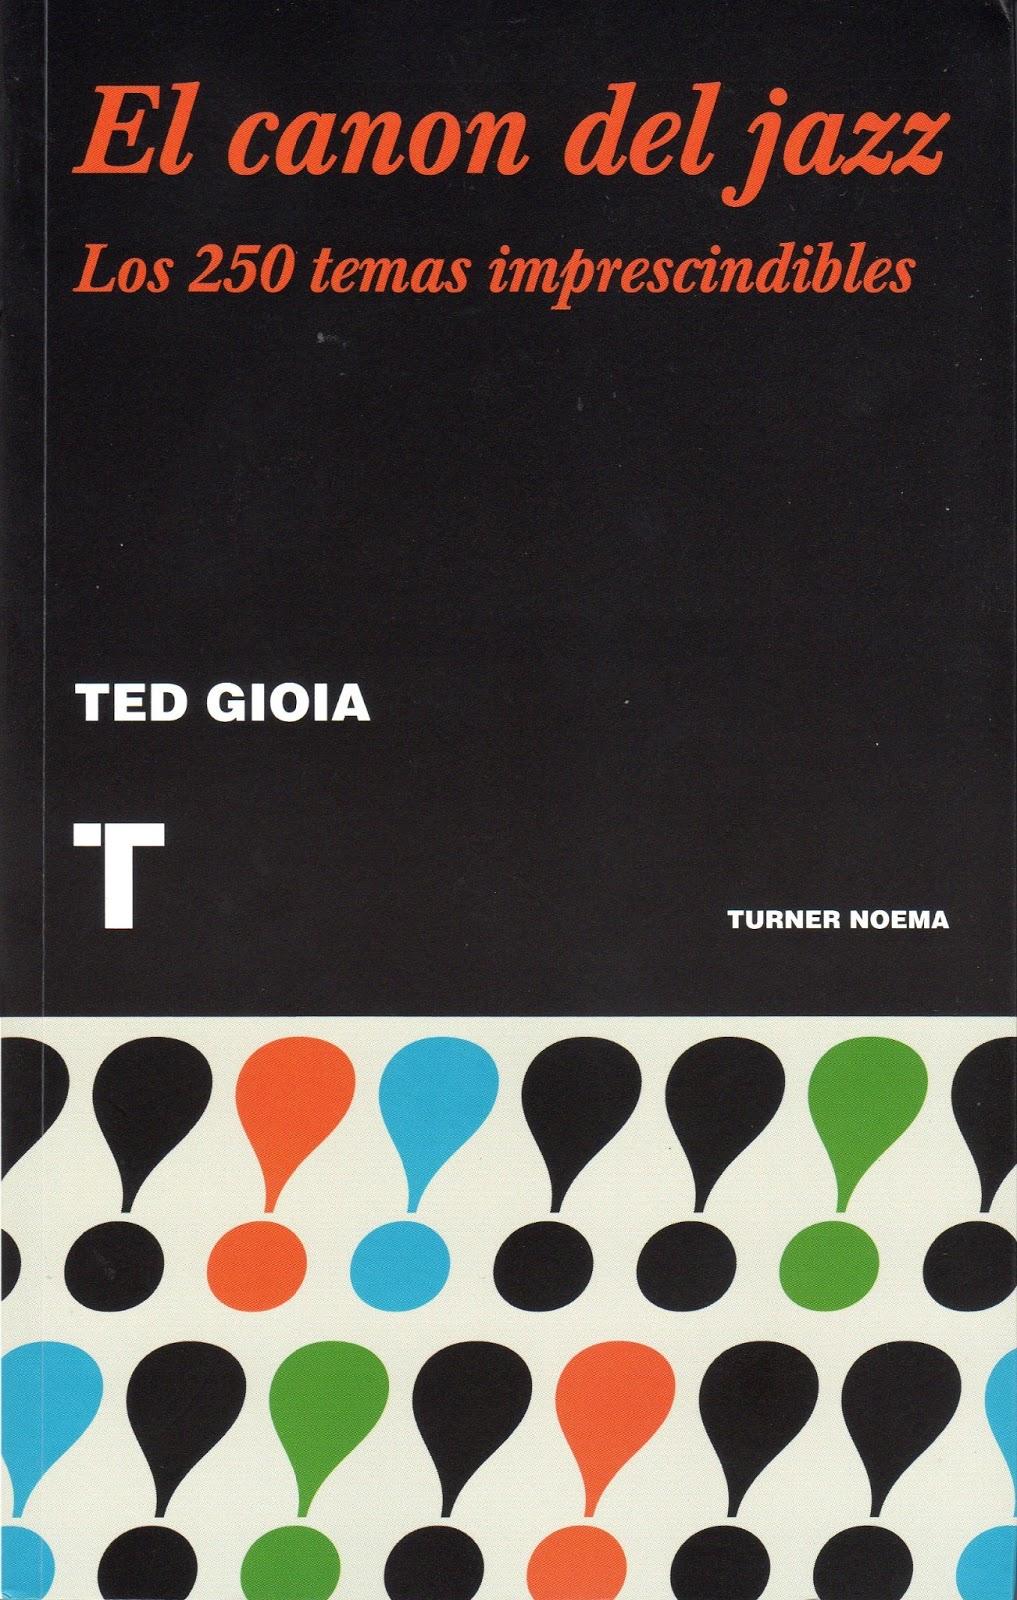 http://3.bp.blogspot.com/-AKHKQLHT4Uo/UdhKGtJDalI/AAAAAAAAAZc/PNo7zDu0lOs/s1600/Res13-06-30+Ted+Gioia.jpg